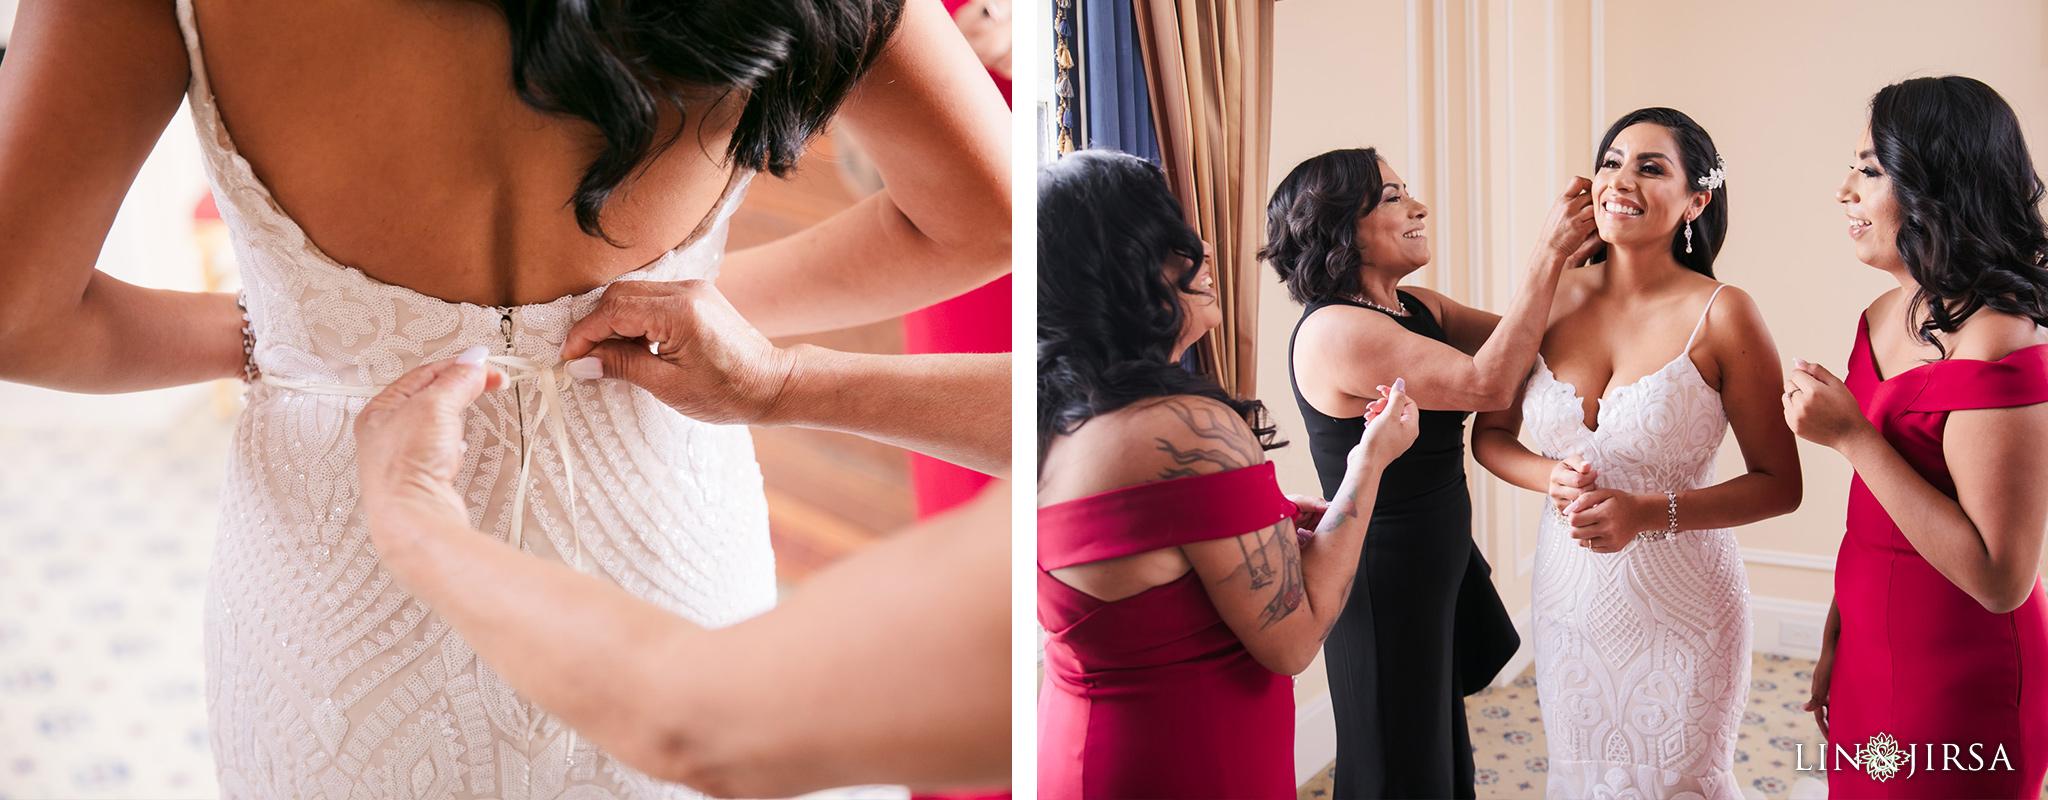 0025 Alexandria Ballroom Los Angeles County Wedding Photography